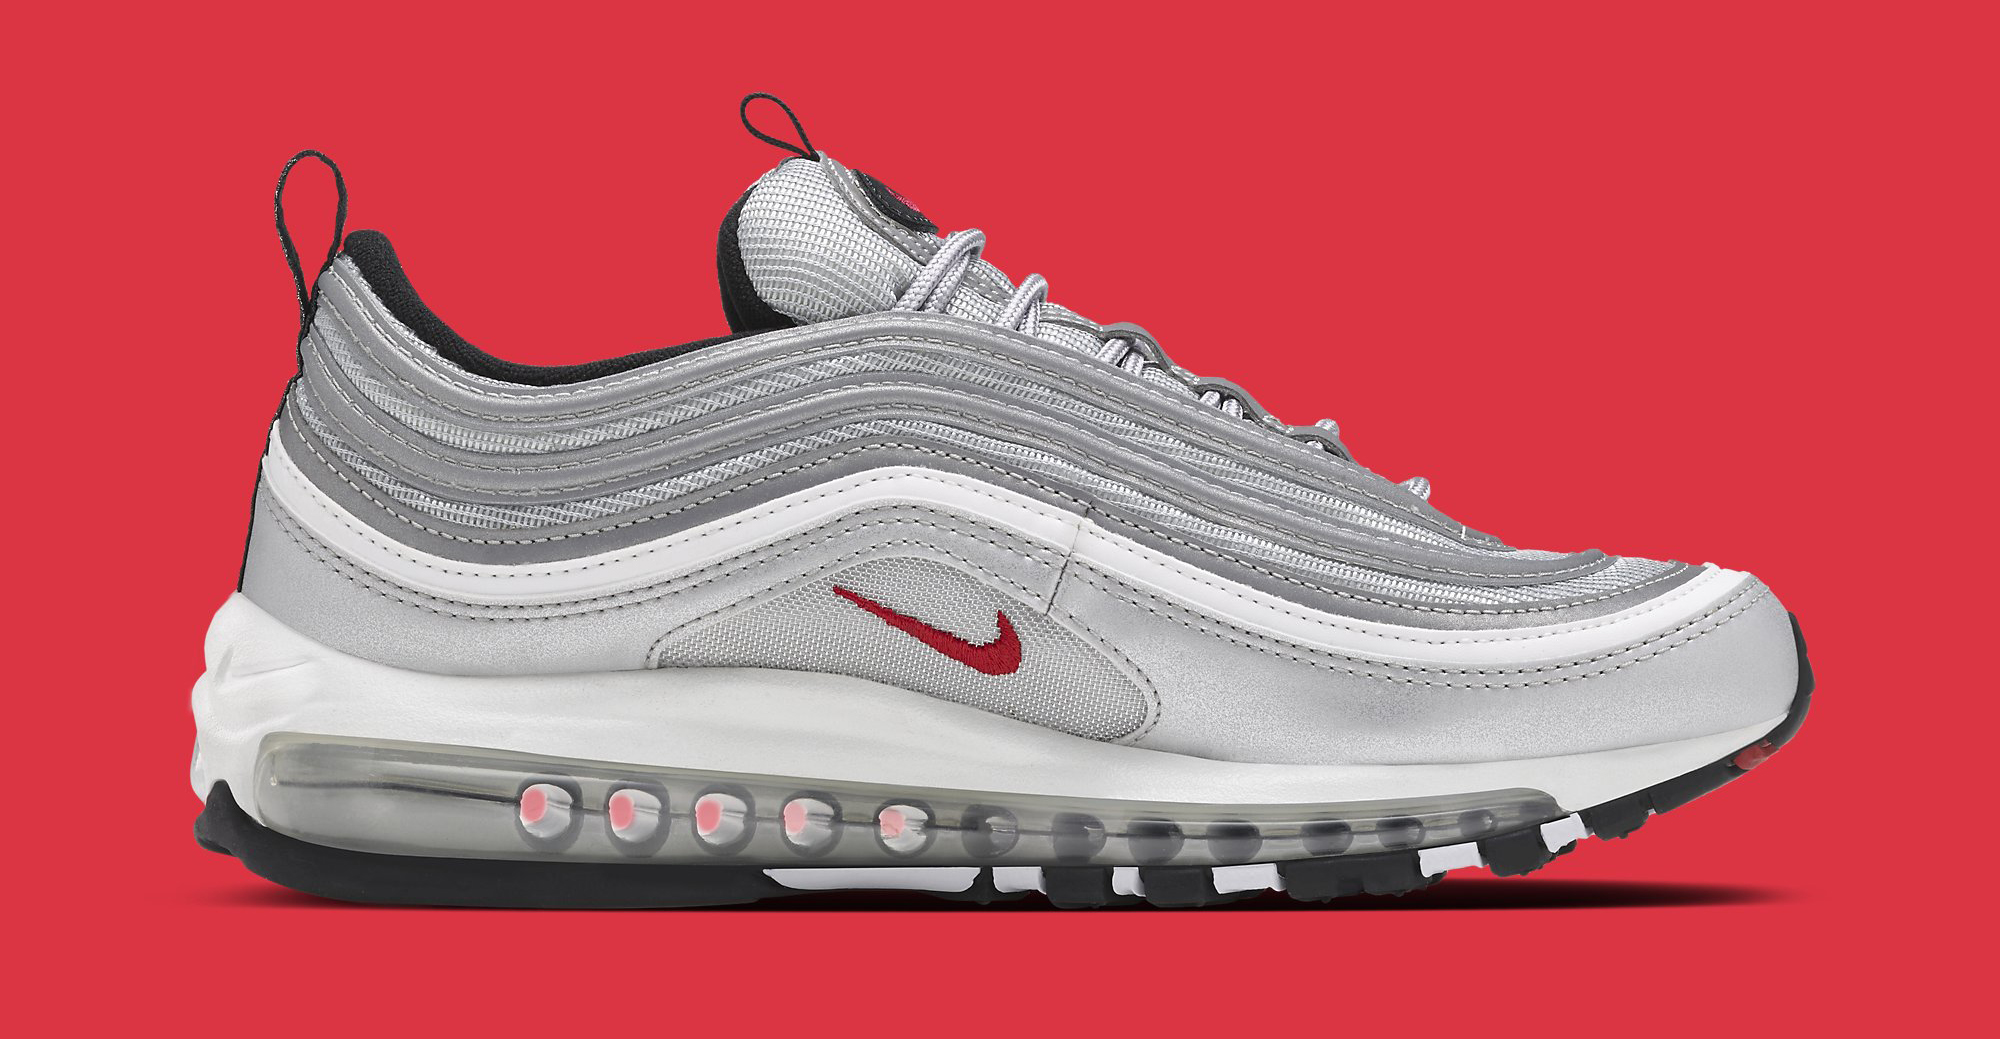 Silver Nike Air Max 97 884421-001 Medial